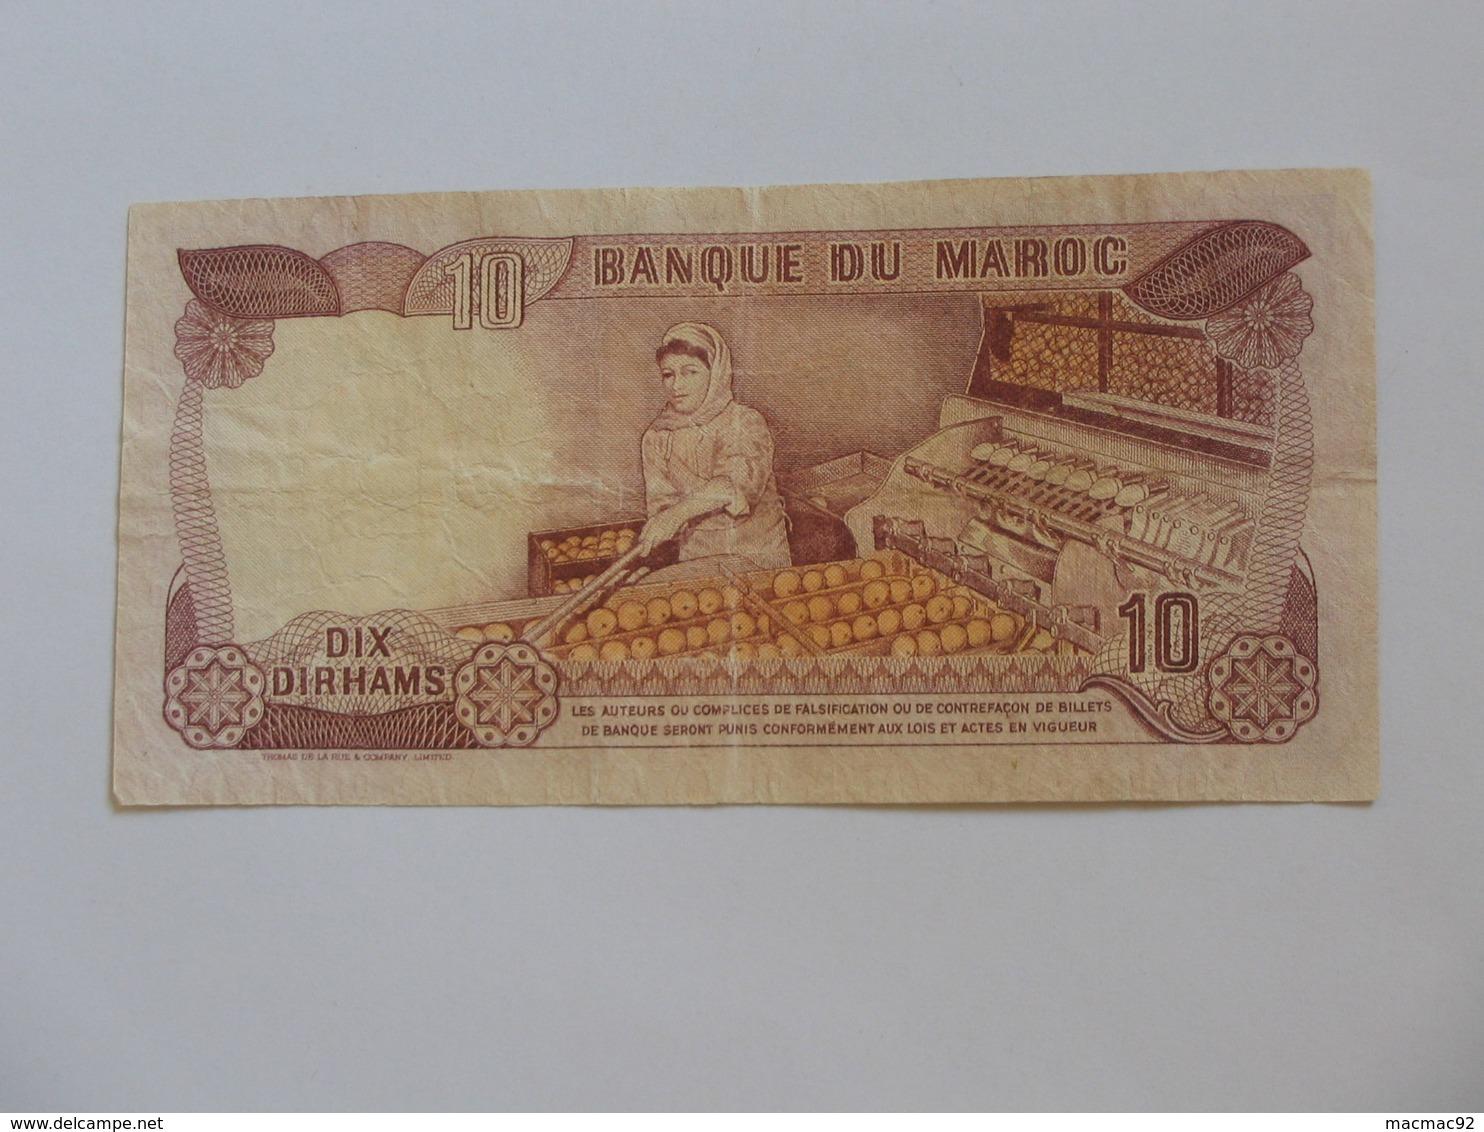 10 Dirhams 1970-1390 Maroc - Banque Du Maroc  **** EN ACHAT IMMEDIAT **** - Maroc